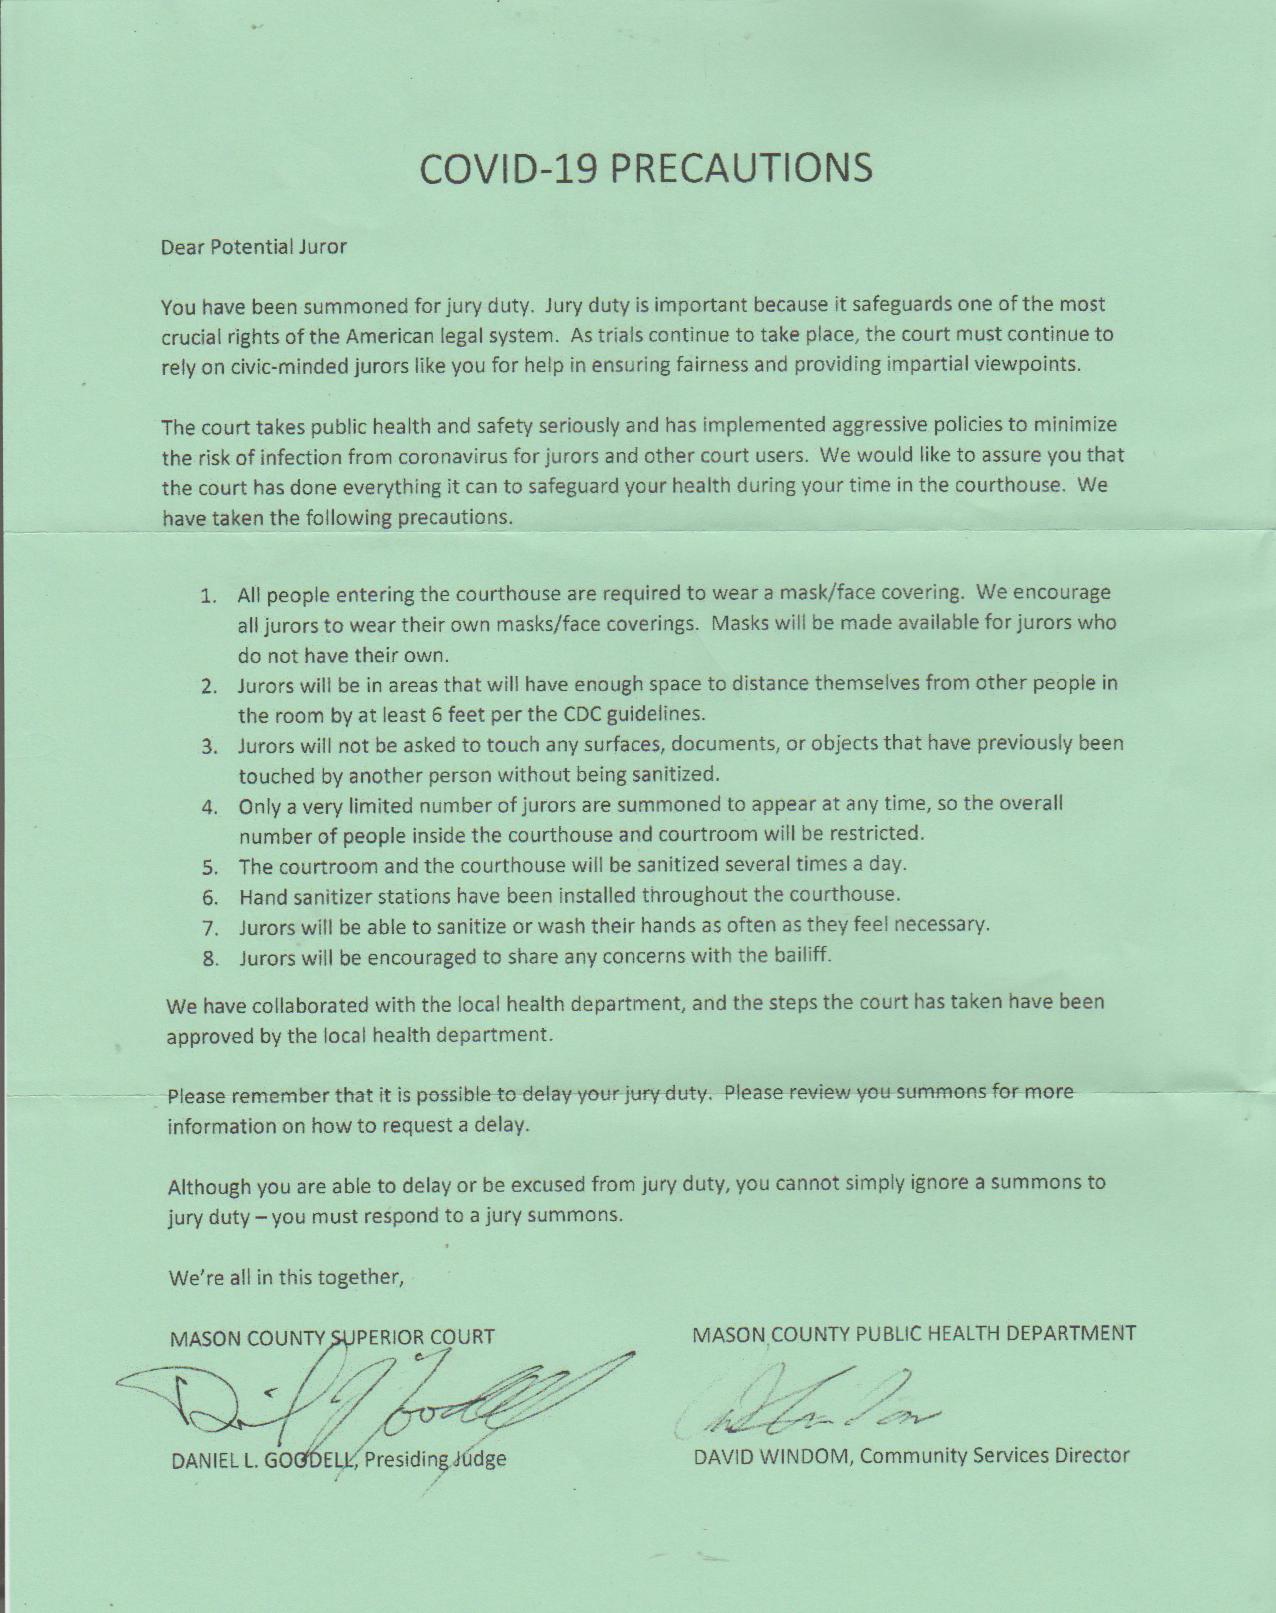 2020-11-07 - Saturday - 03:00 PM LMS JA - Jury Duty Request - Shelton WA - Covid Precaution Info, Fake News, Green Page.png